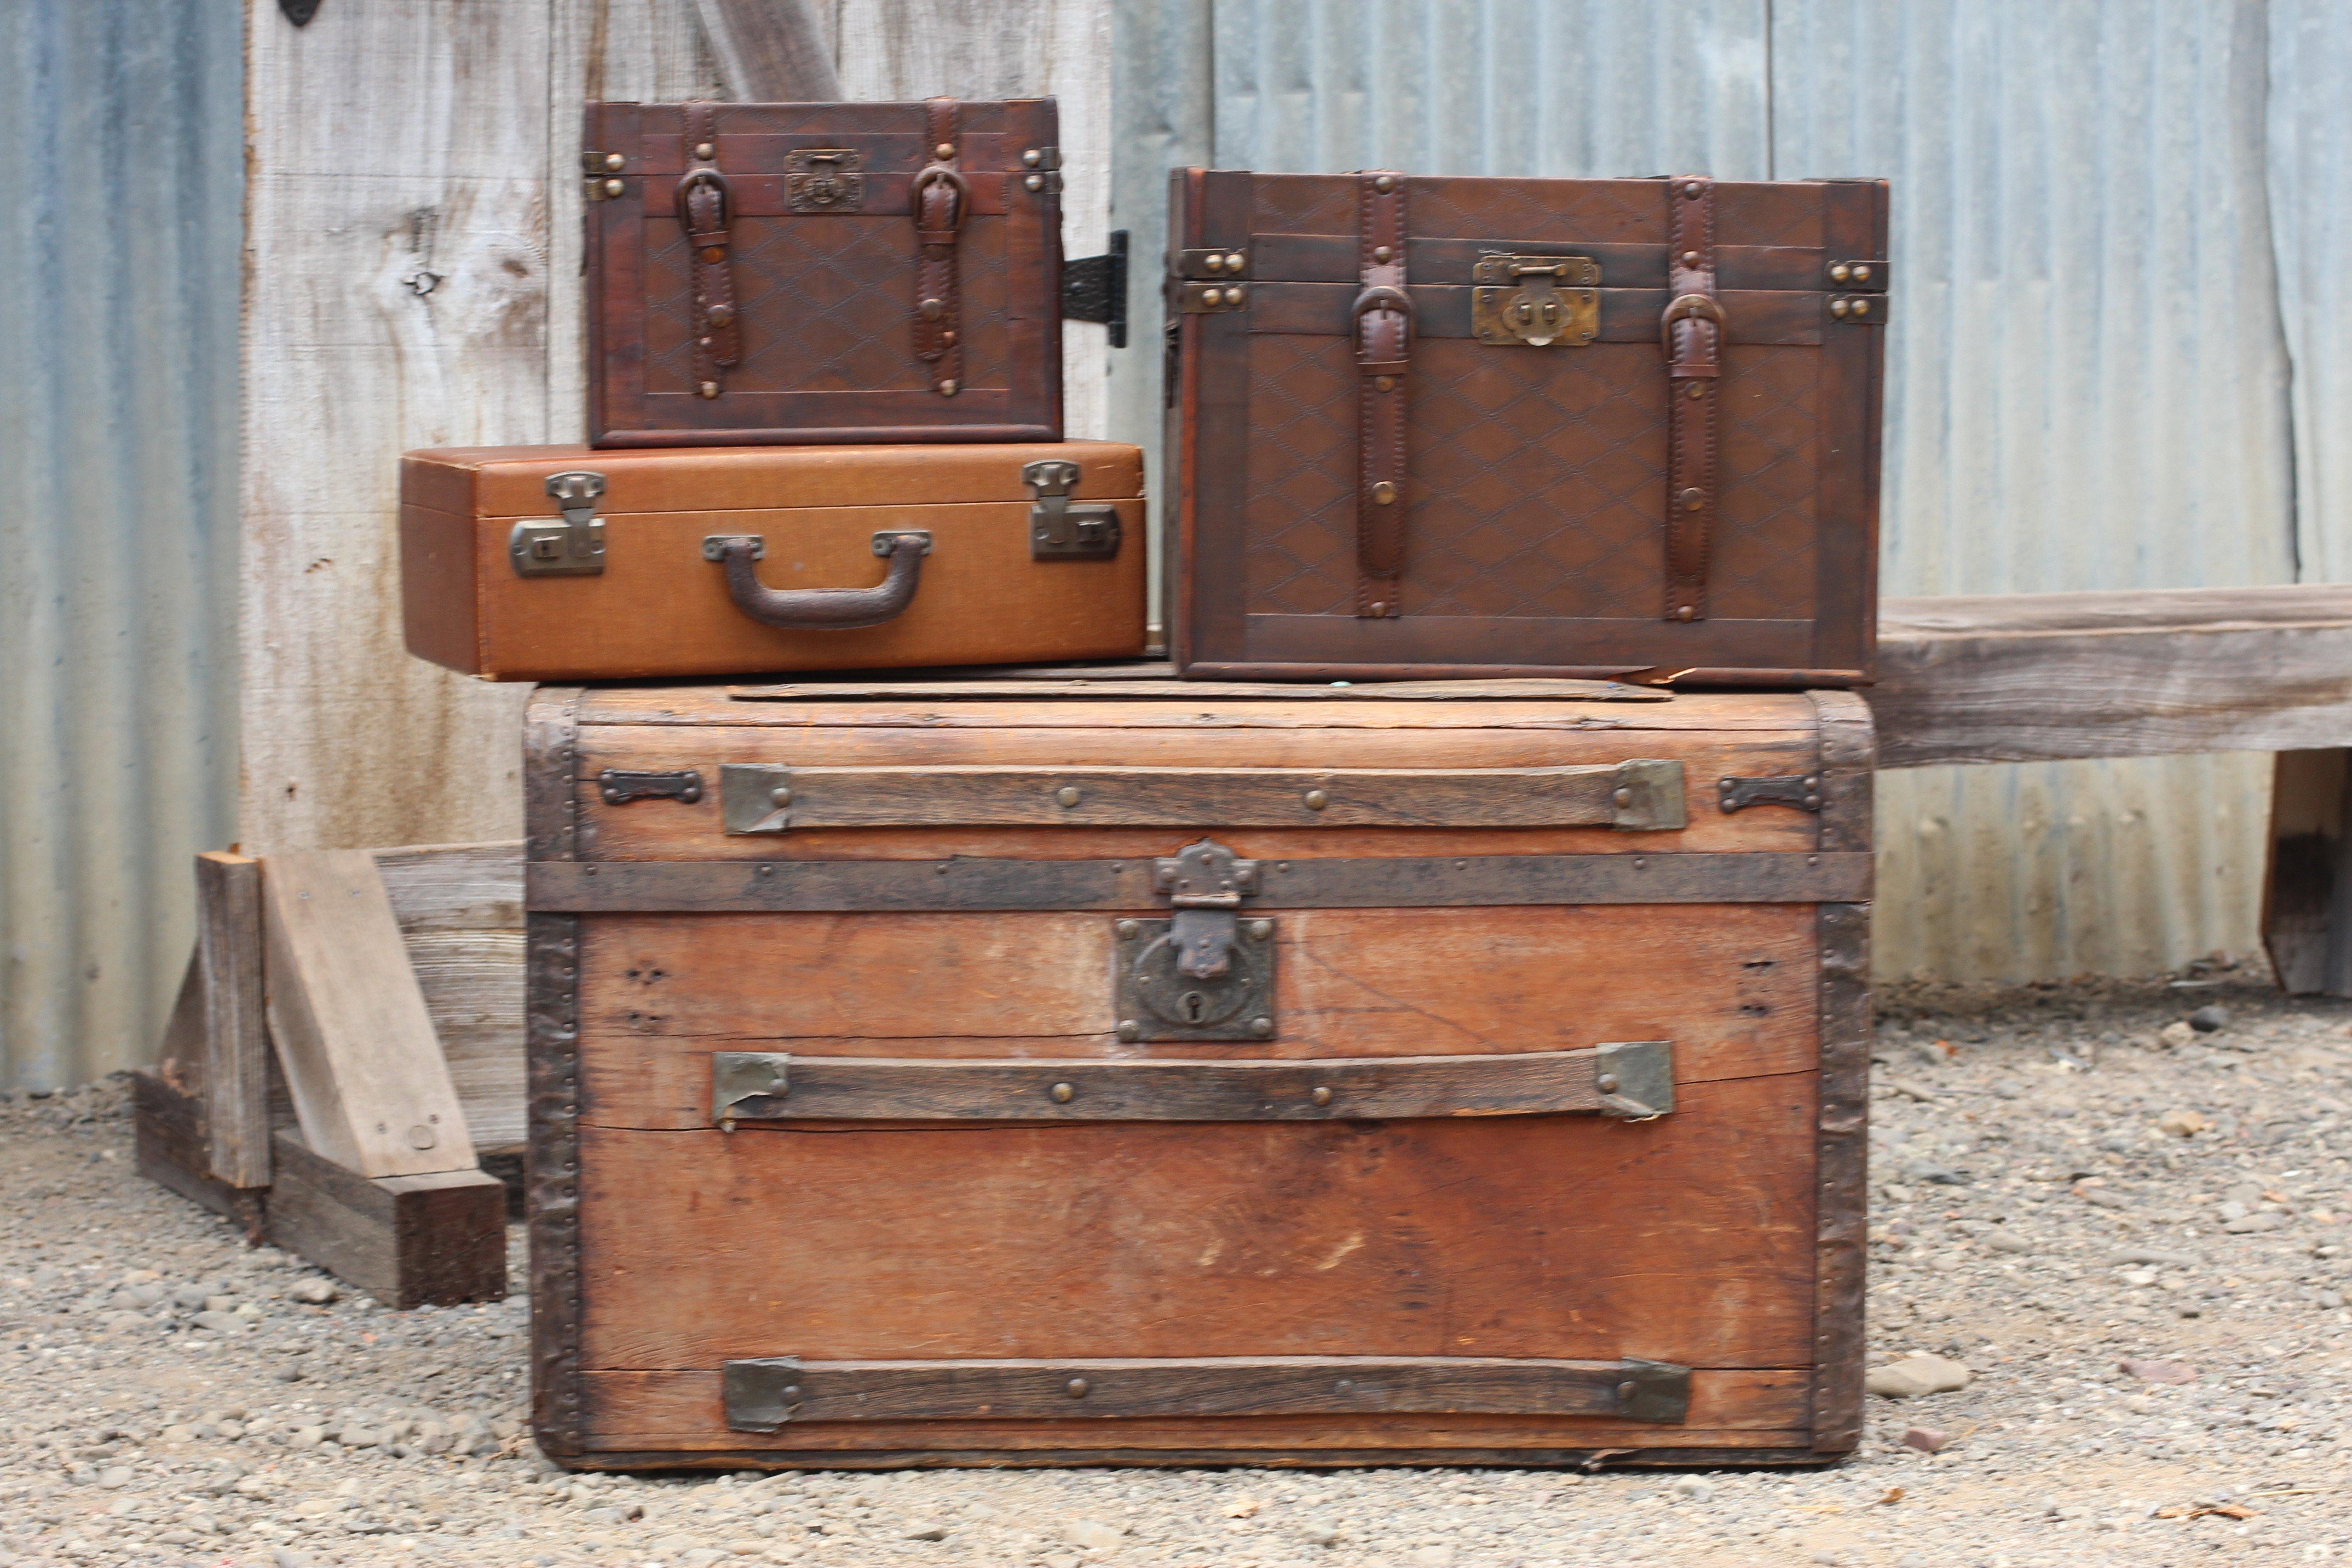 Vintage Trunk/Suitcase Rentals